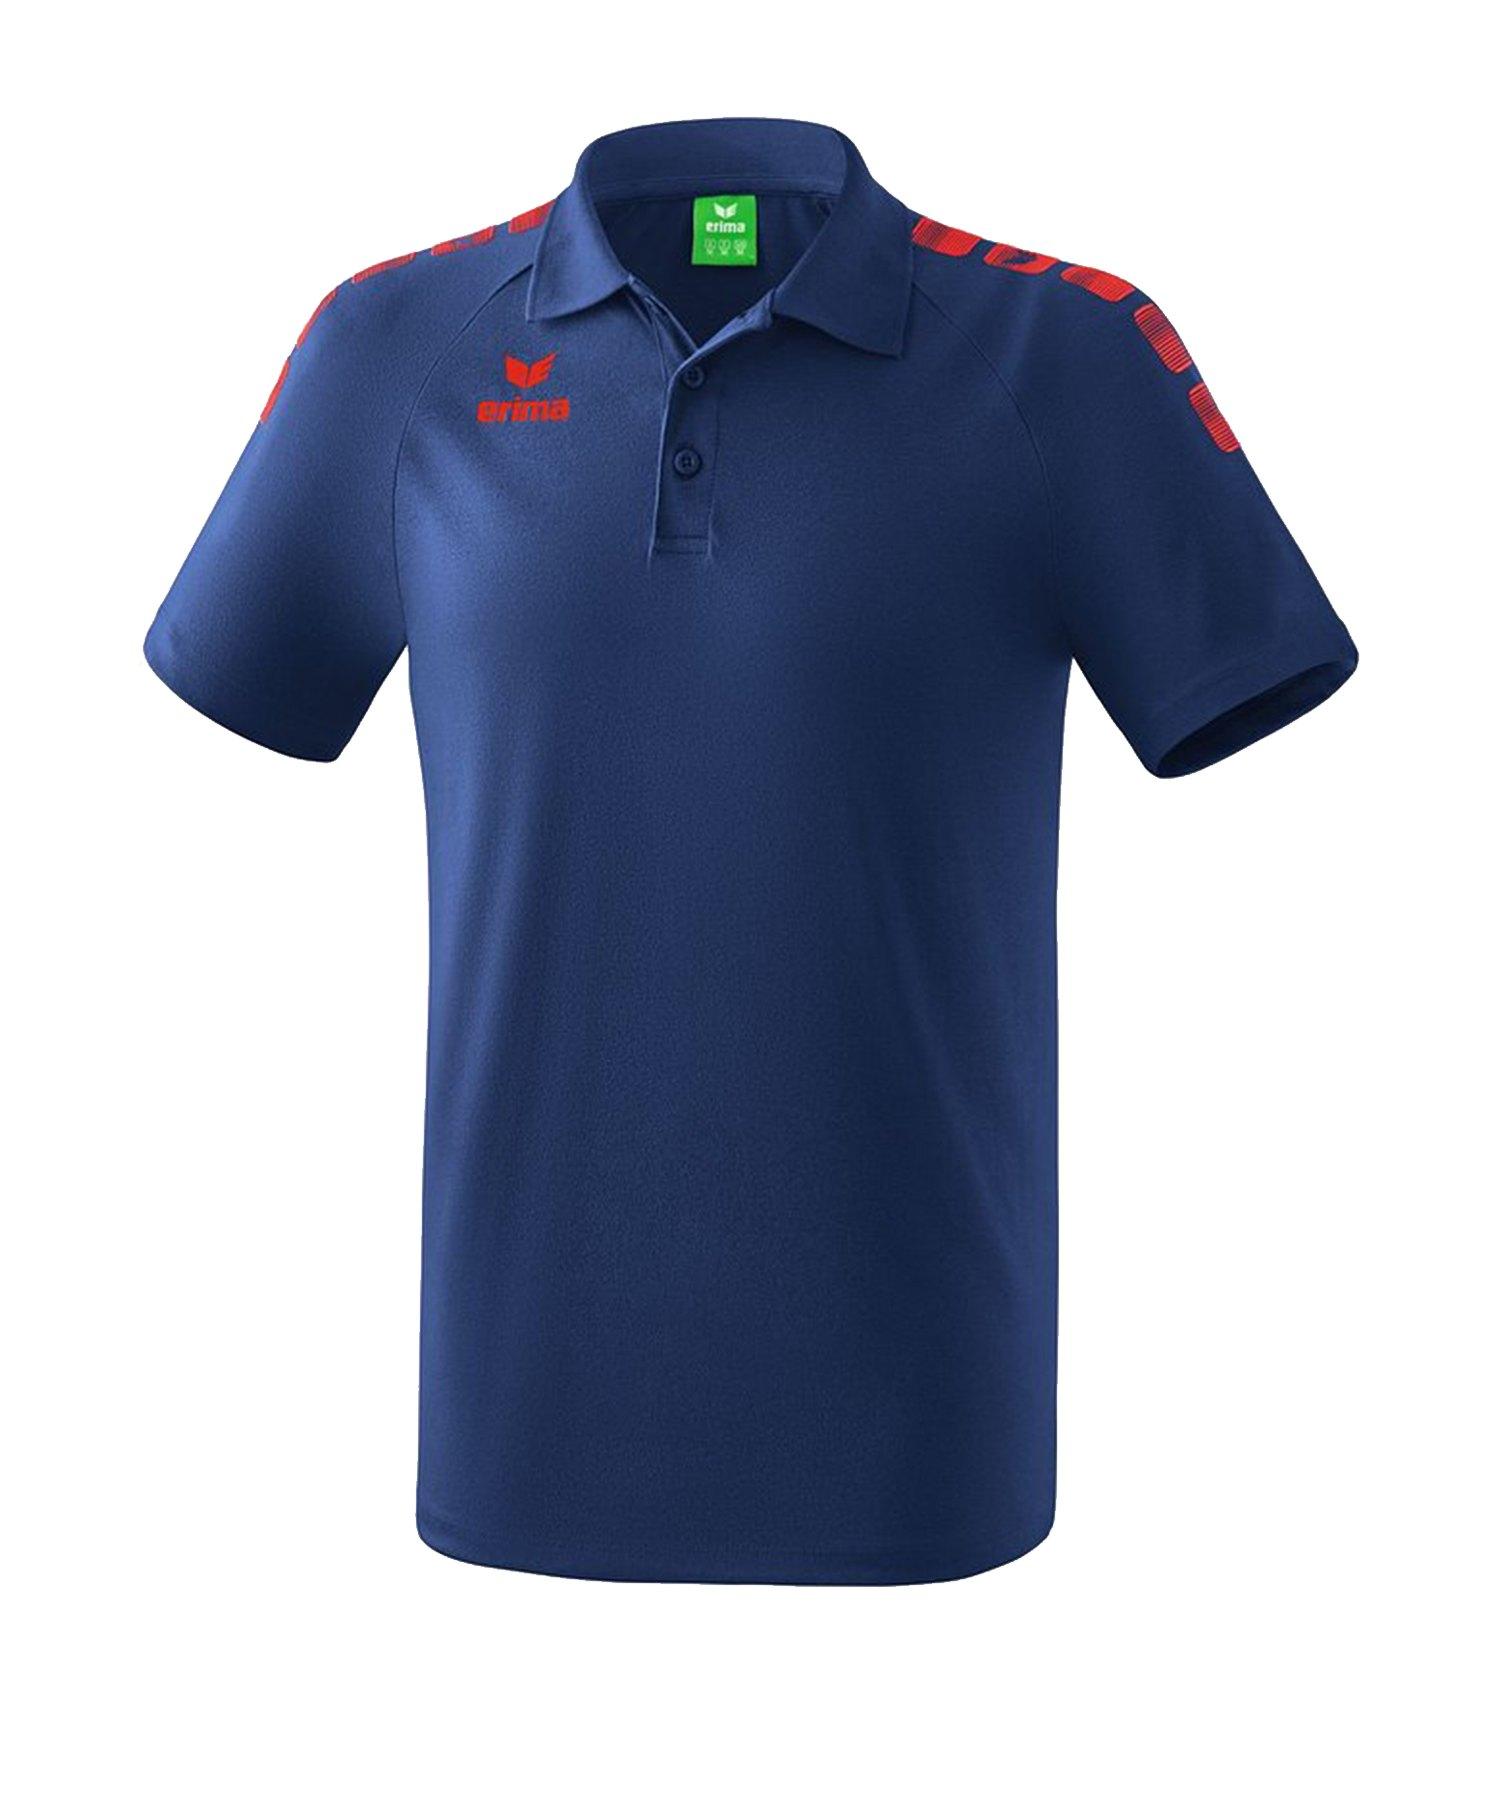 Erima Essential 5-C Poloshirt Blau Rot - Blau